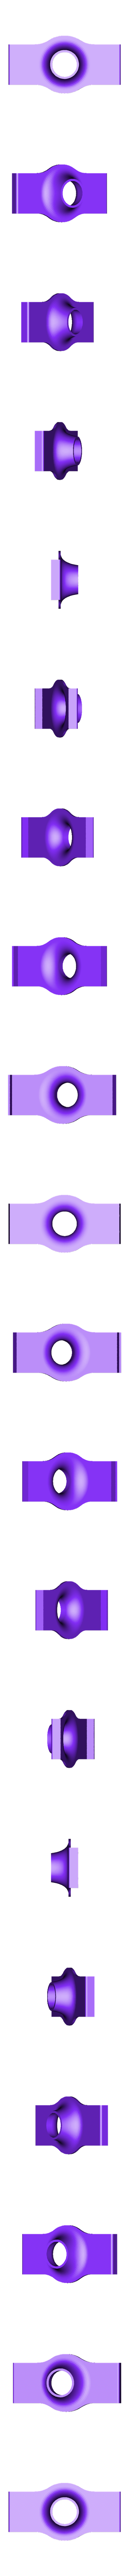 TissueBox_Holder.stl Télécharger fichier STL gratuit Tissue Holder • Plan à imprimer en 3D, WallTosh